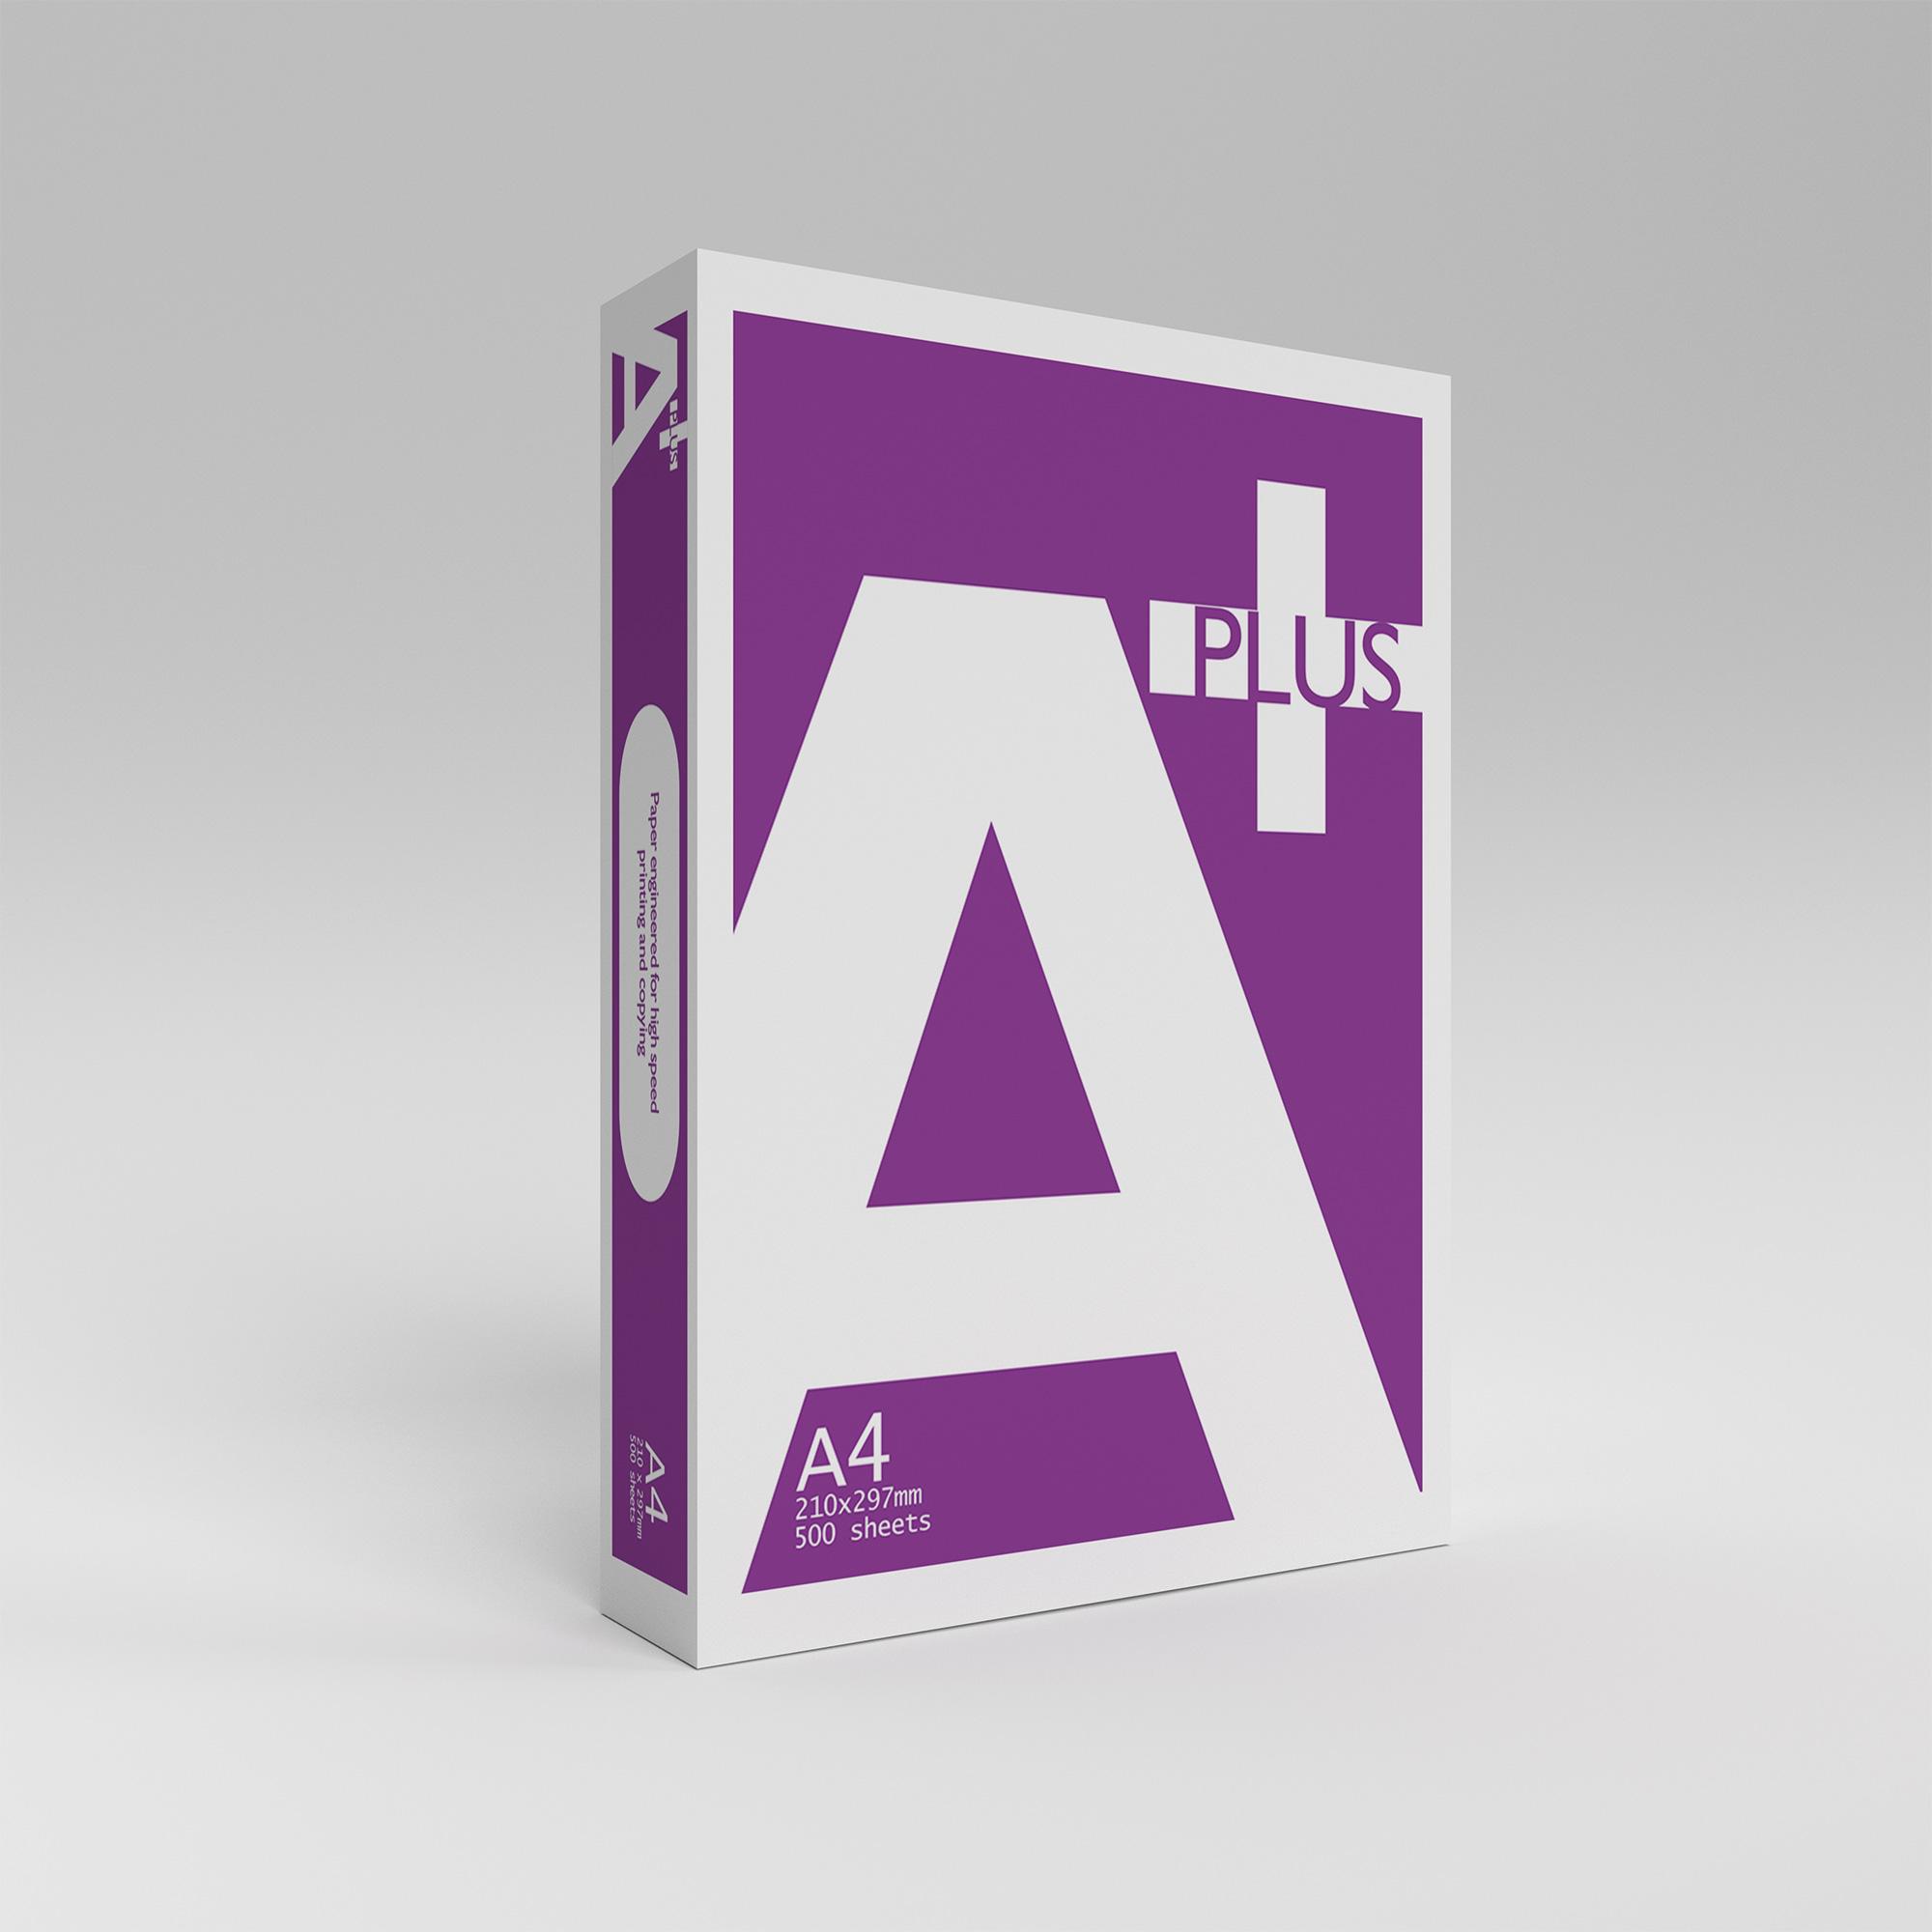 A+Plus A4 70grs. Extra opdikkend, vanaf € 2,23